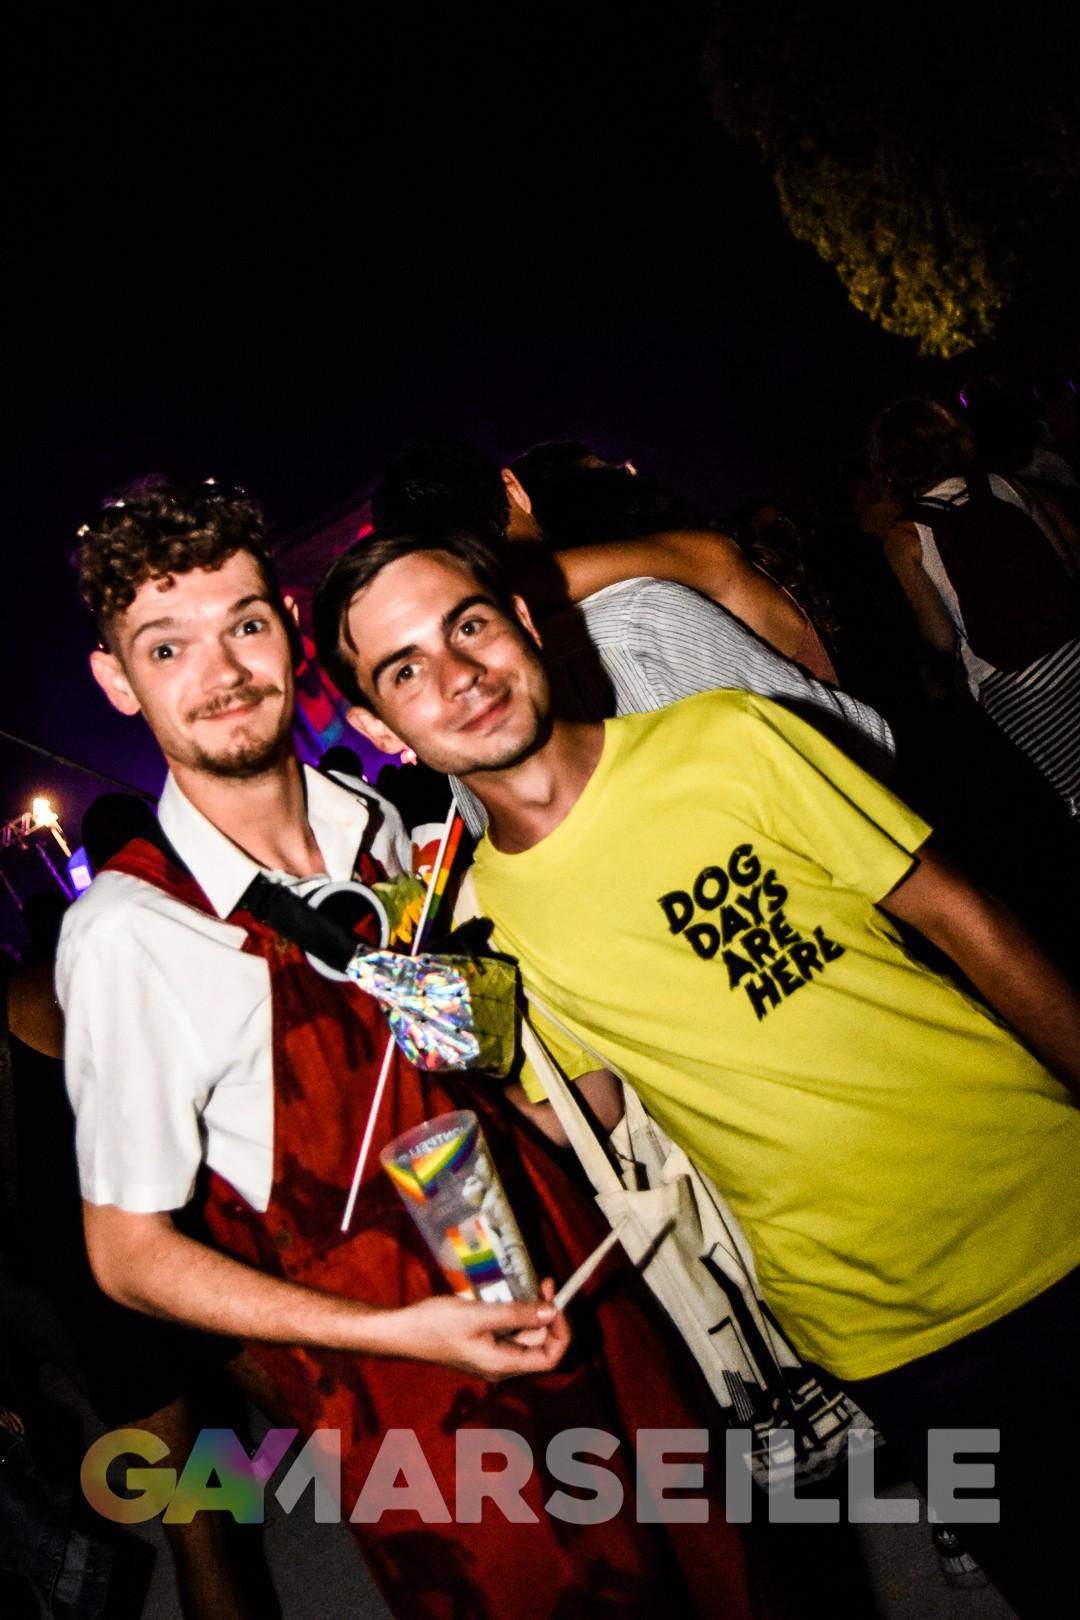 gay pride rencontre à Montpellier